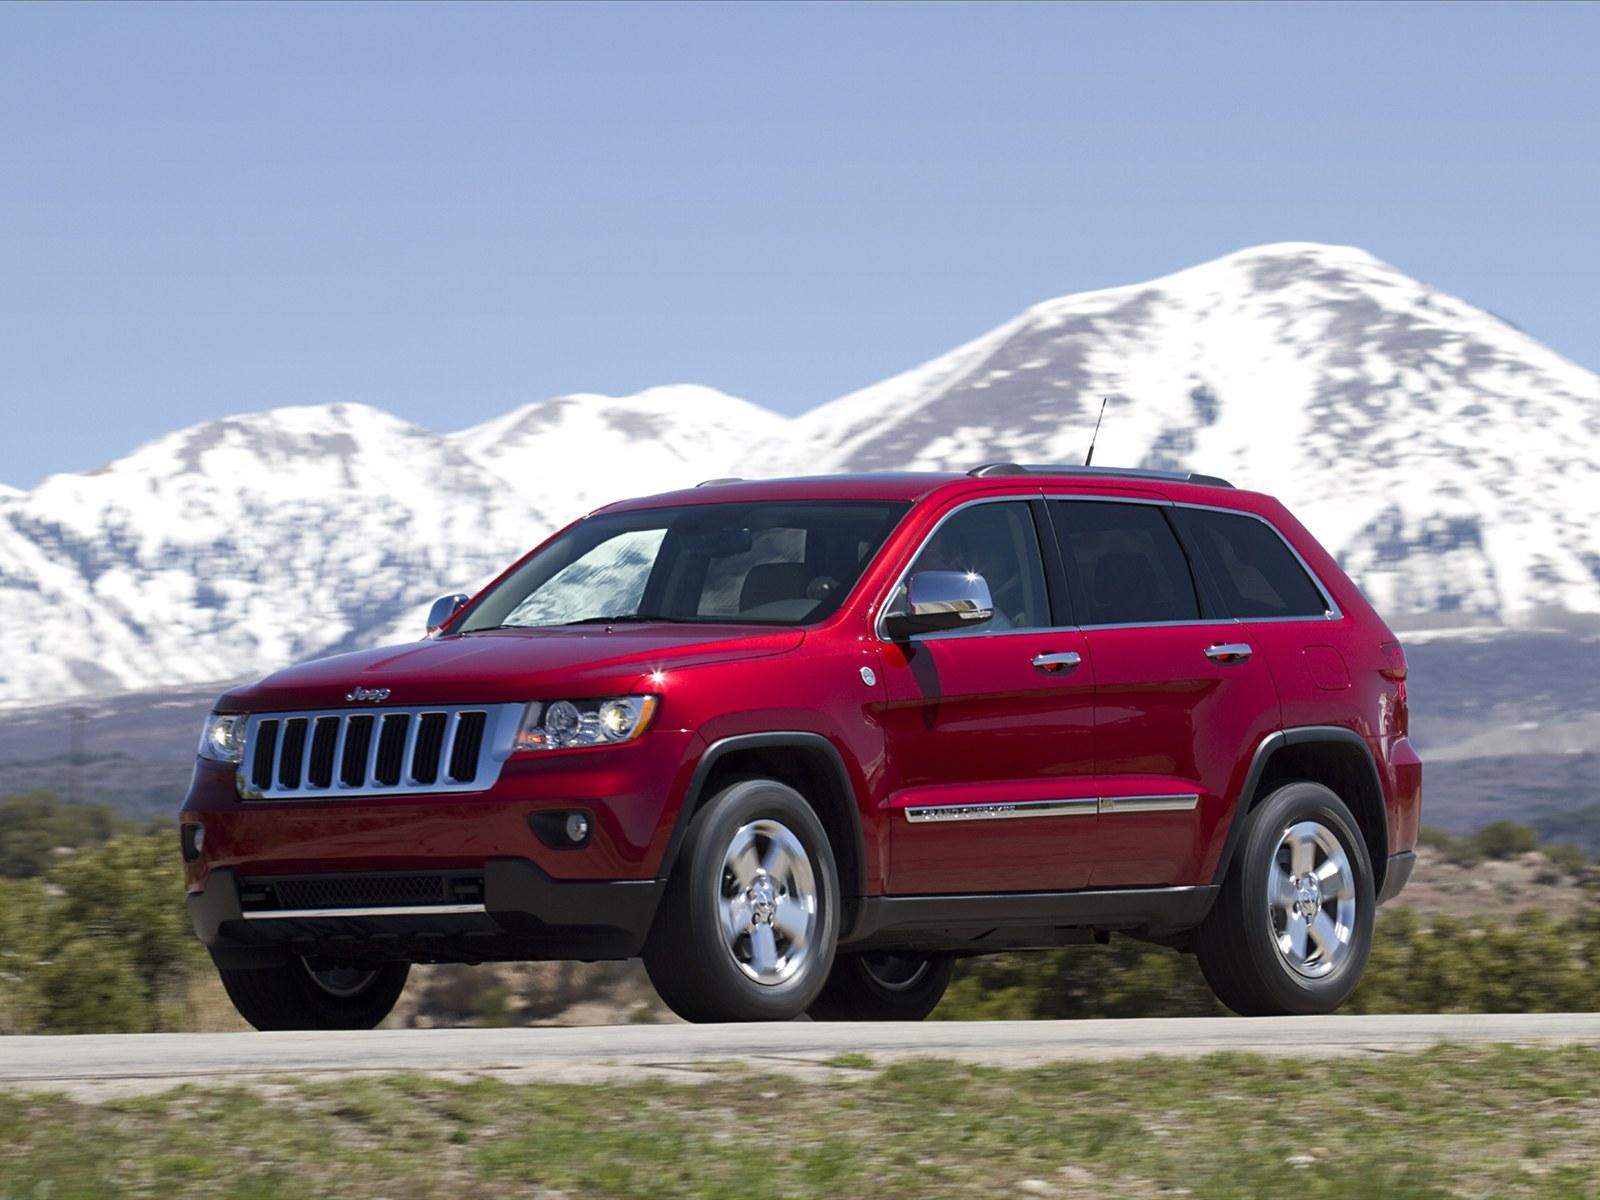 medium resolution of 2011 jeep grand cherokee leveling kit